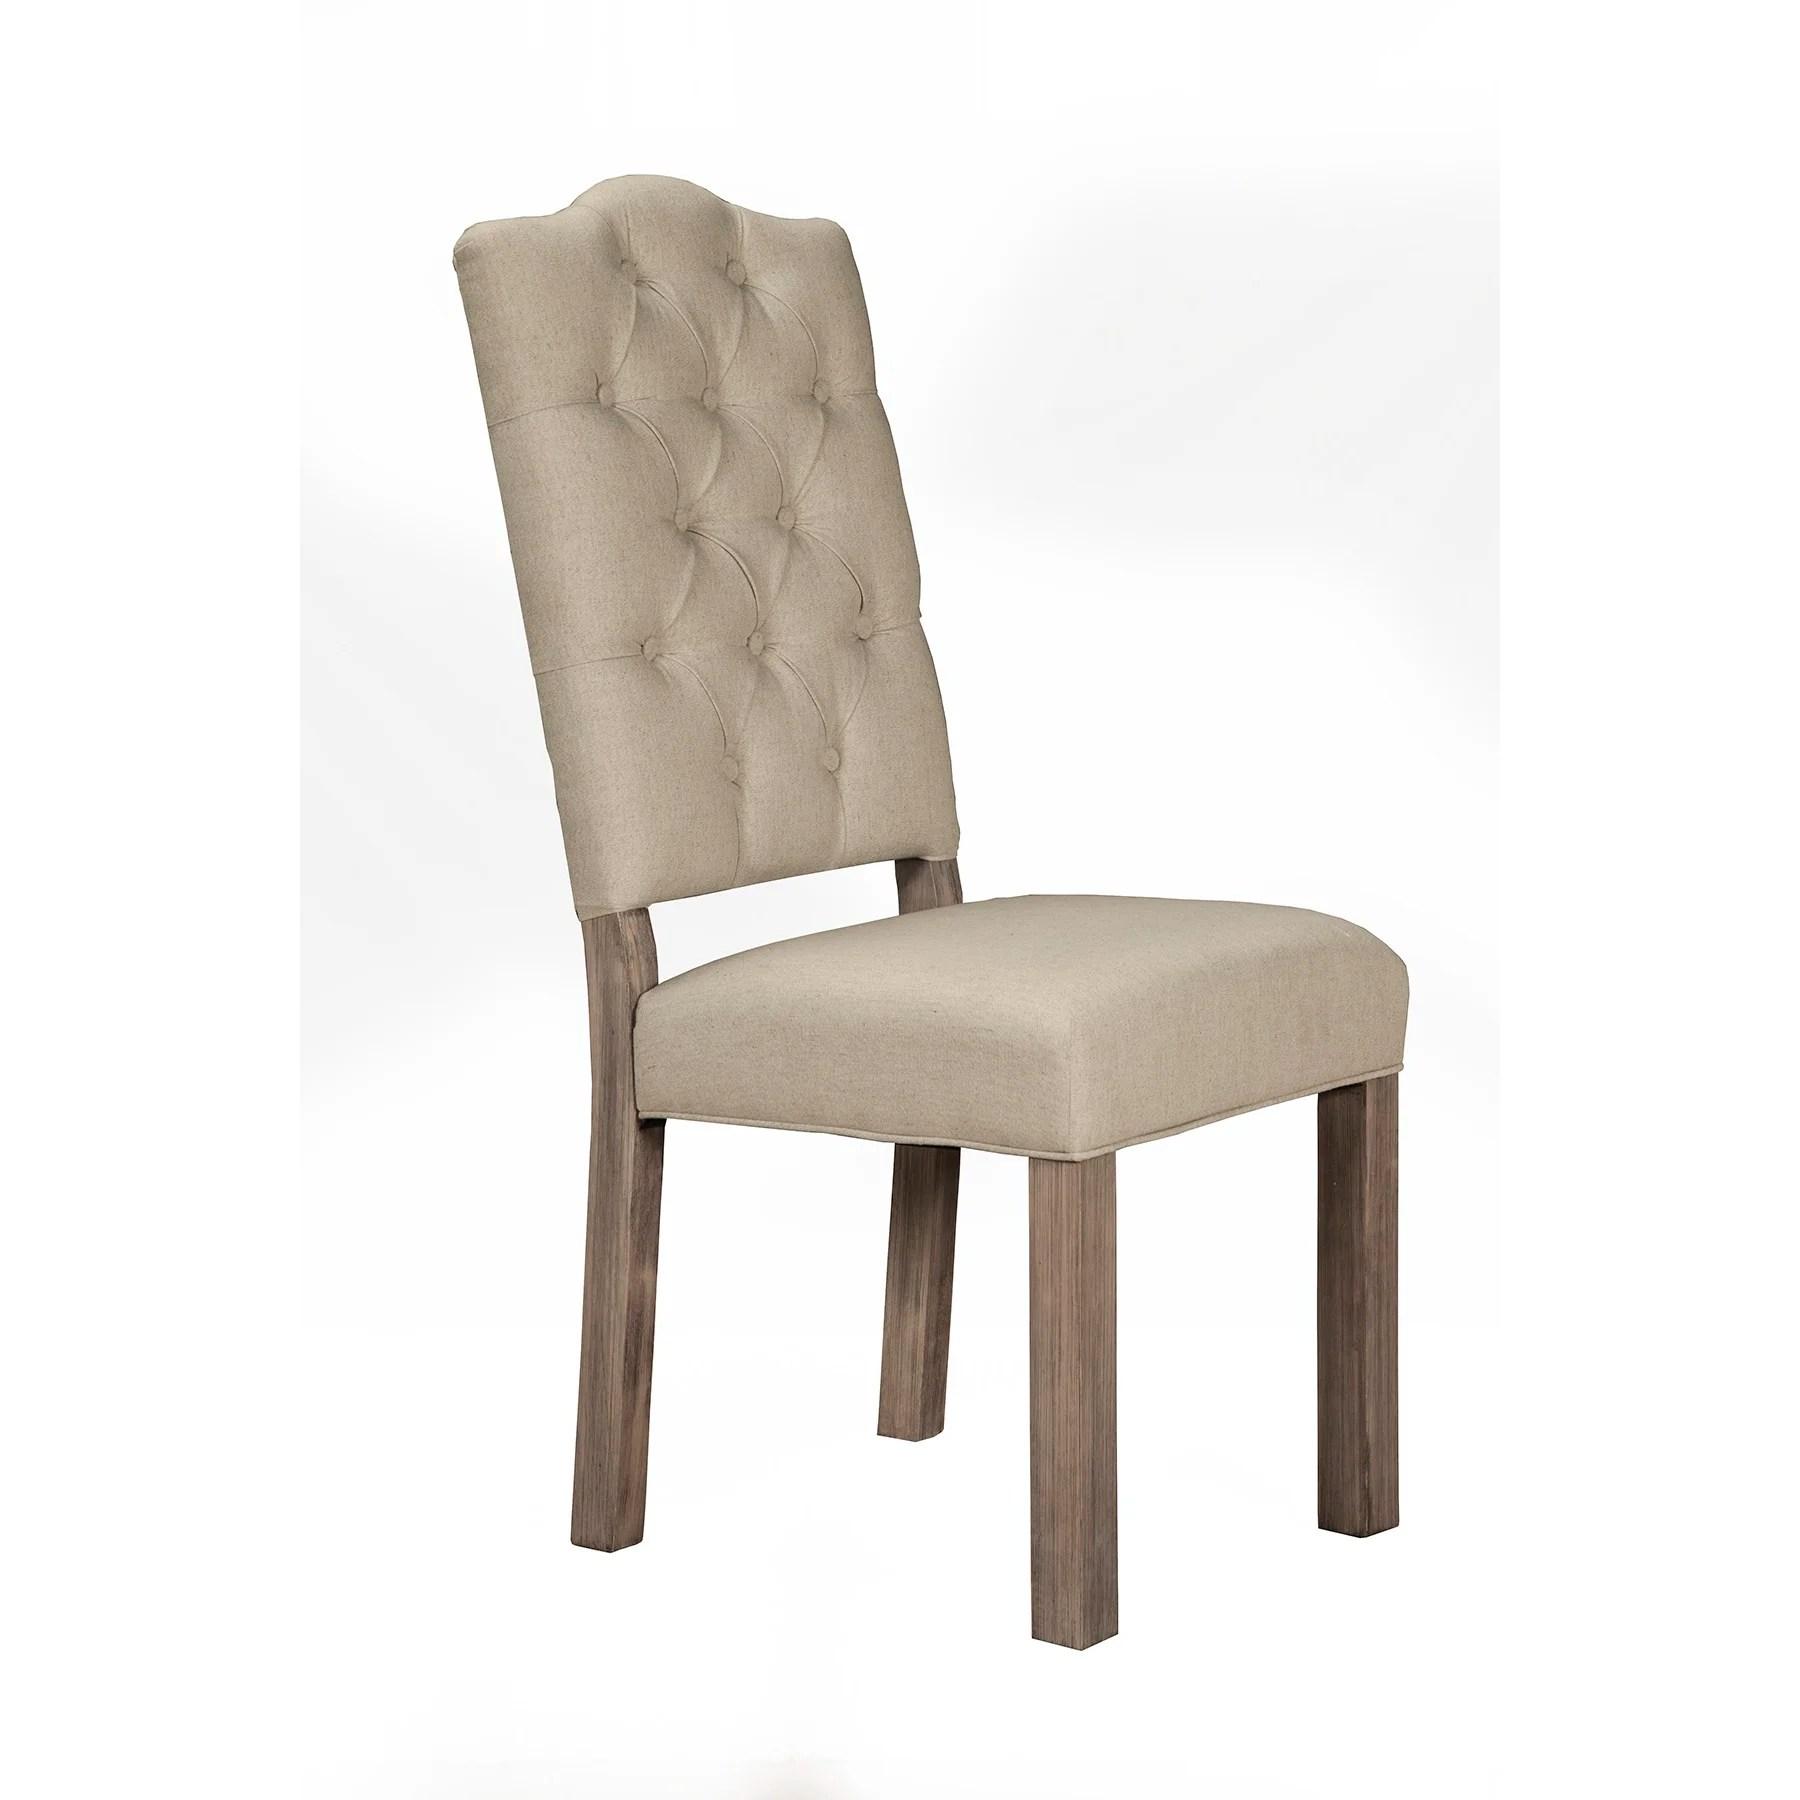 tufted side chair revolving specification fiji upholstered wayfair